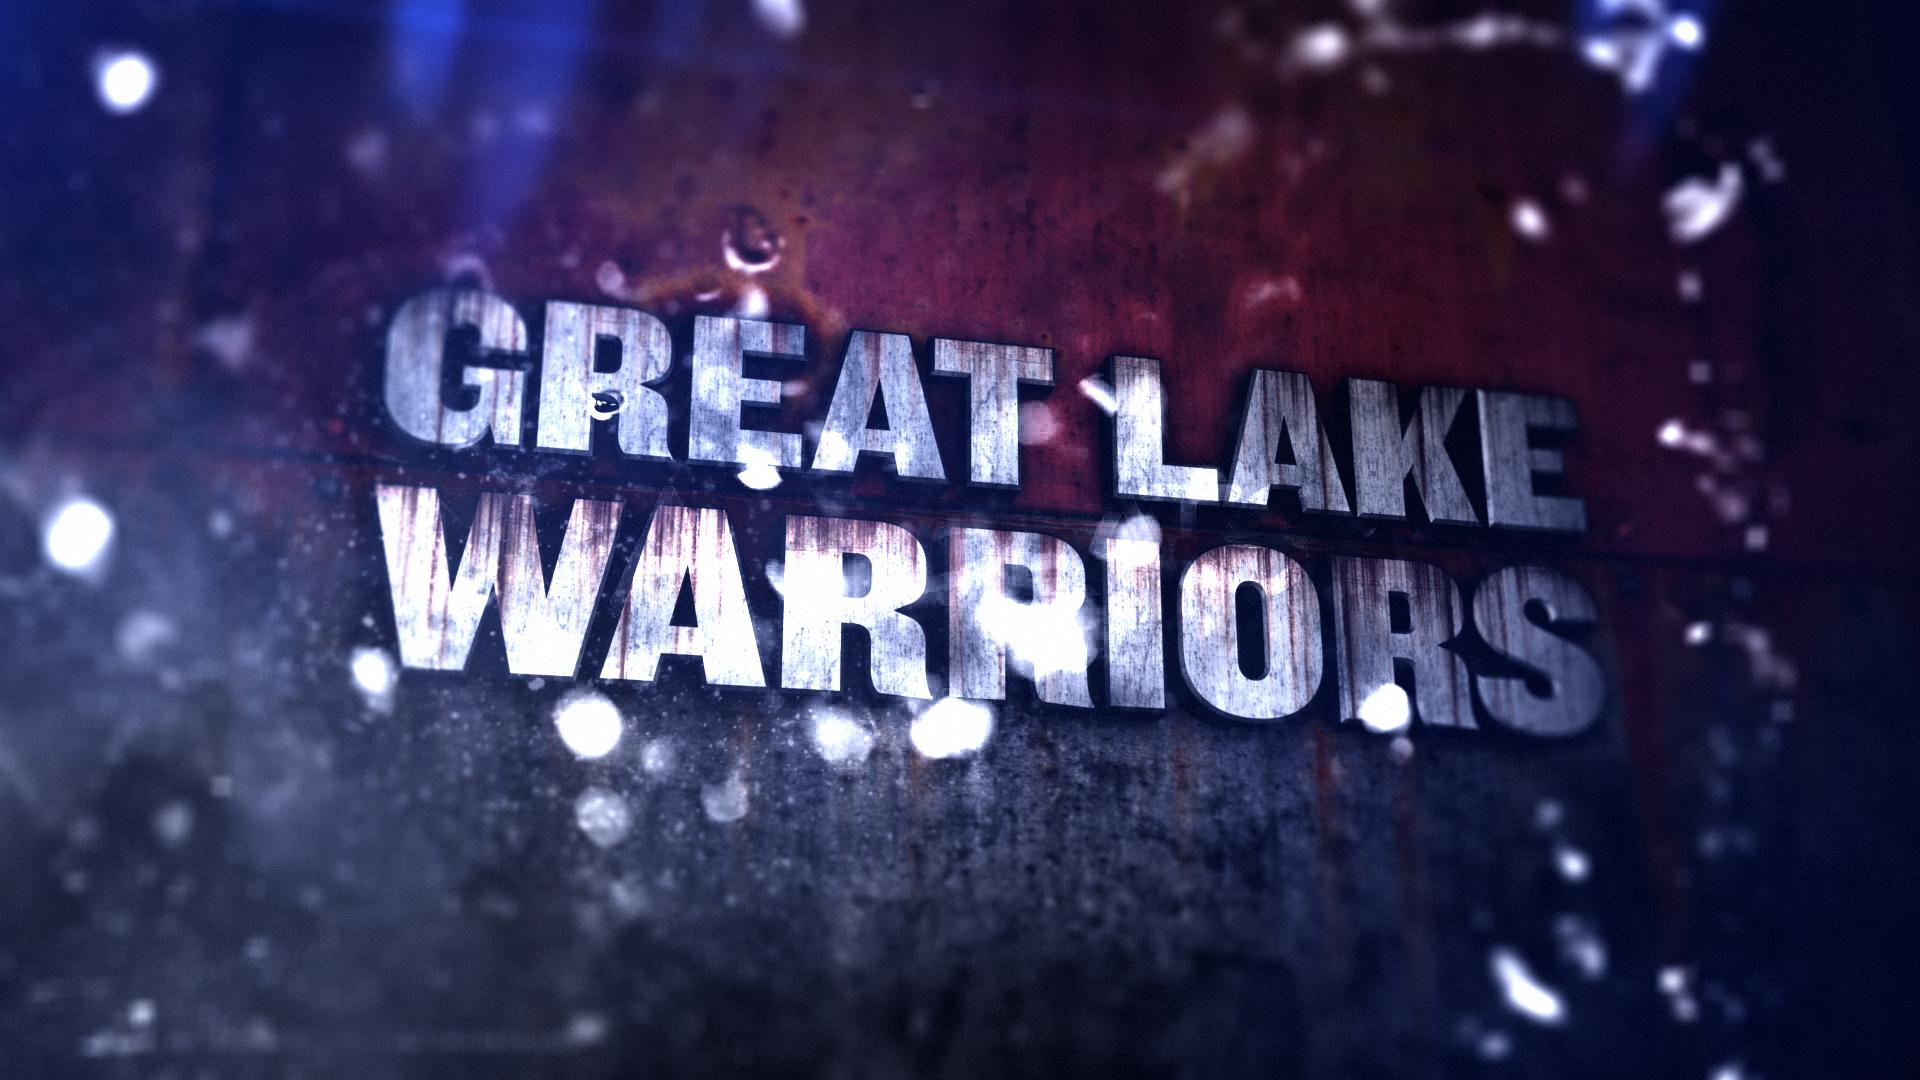 GLW_Logo_Test_01_01c.jpg